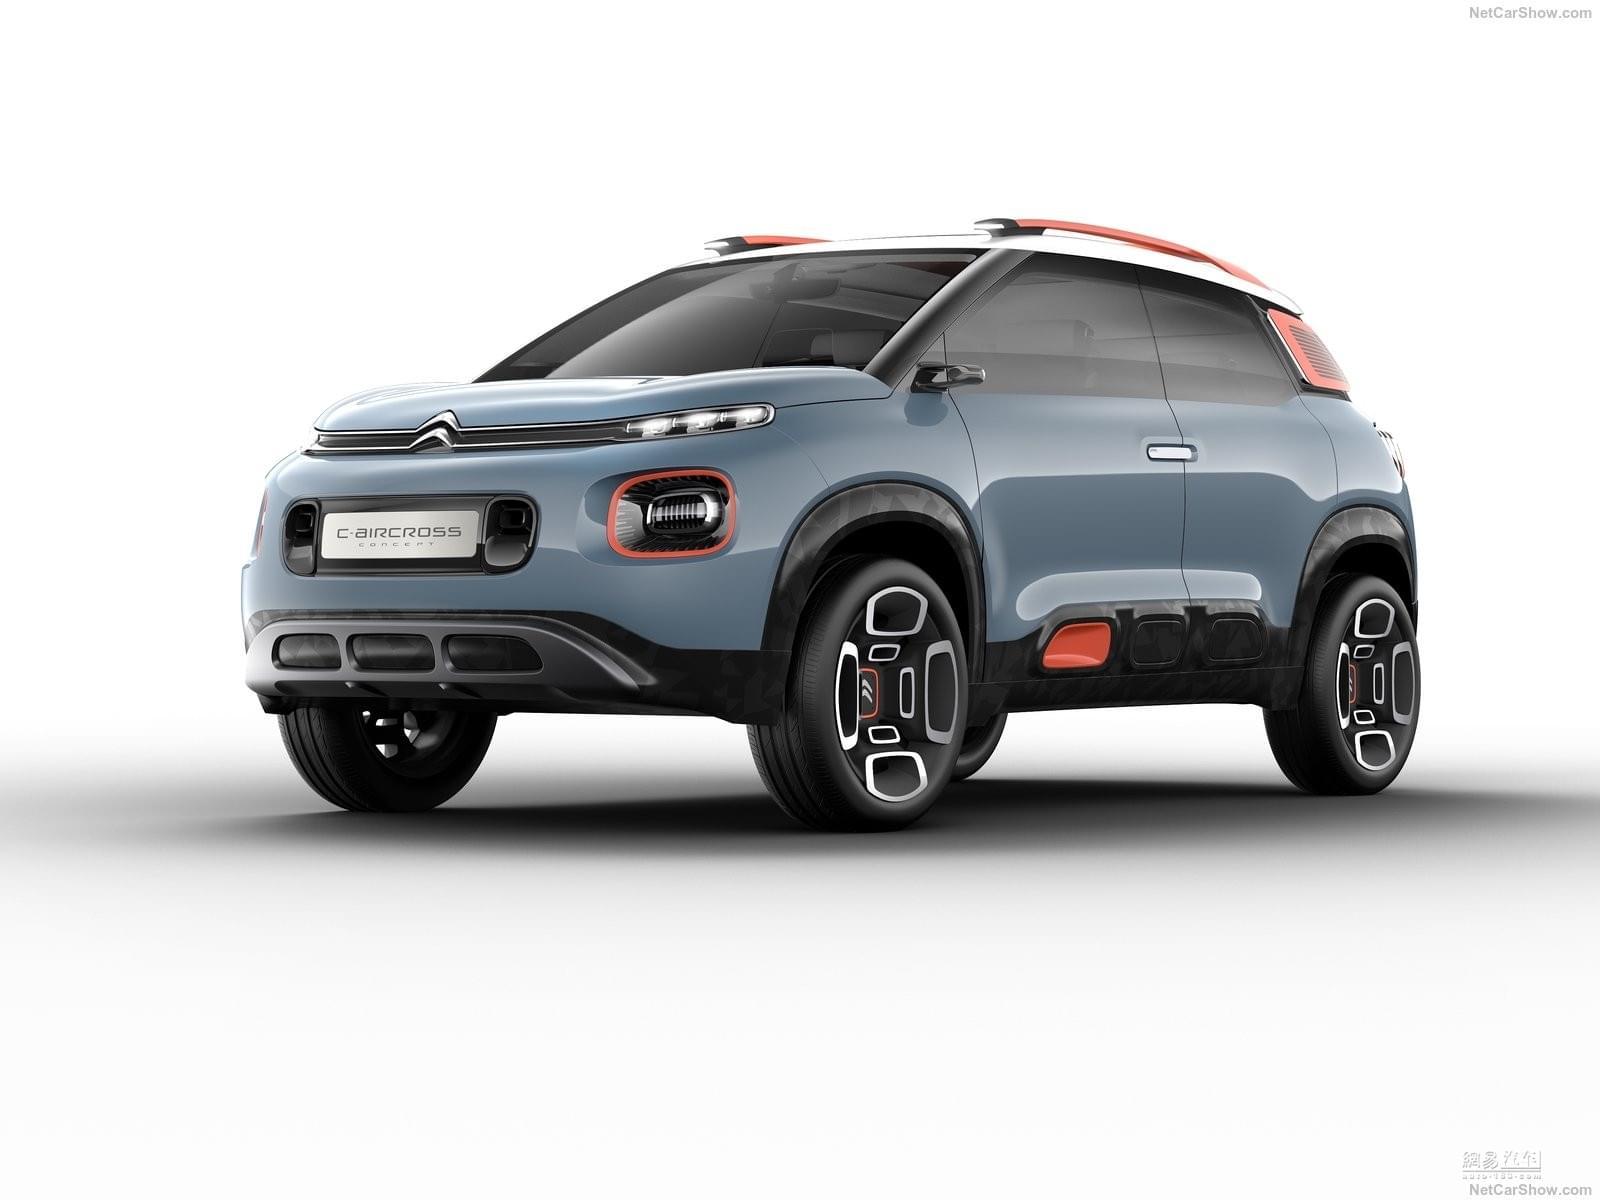 定位紧凑型SUV C-Aircross Concept官图发布